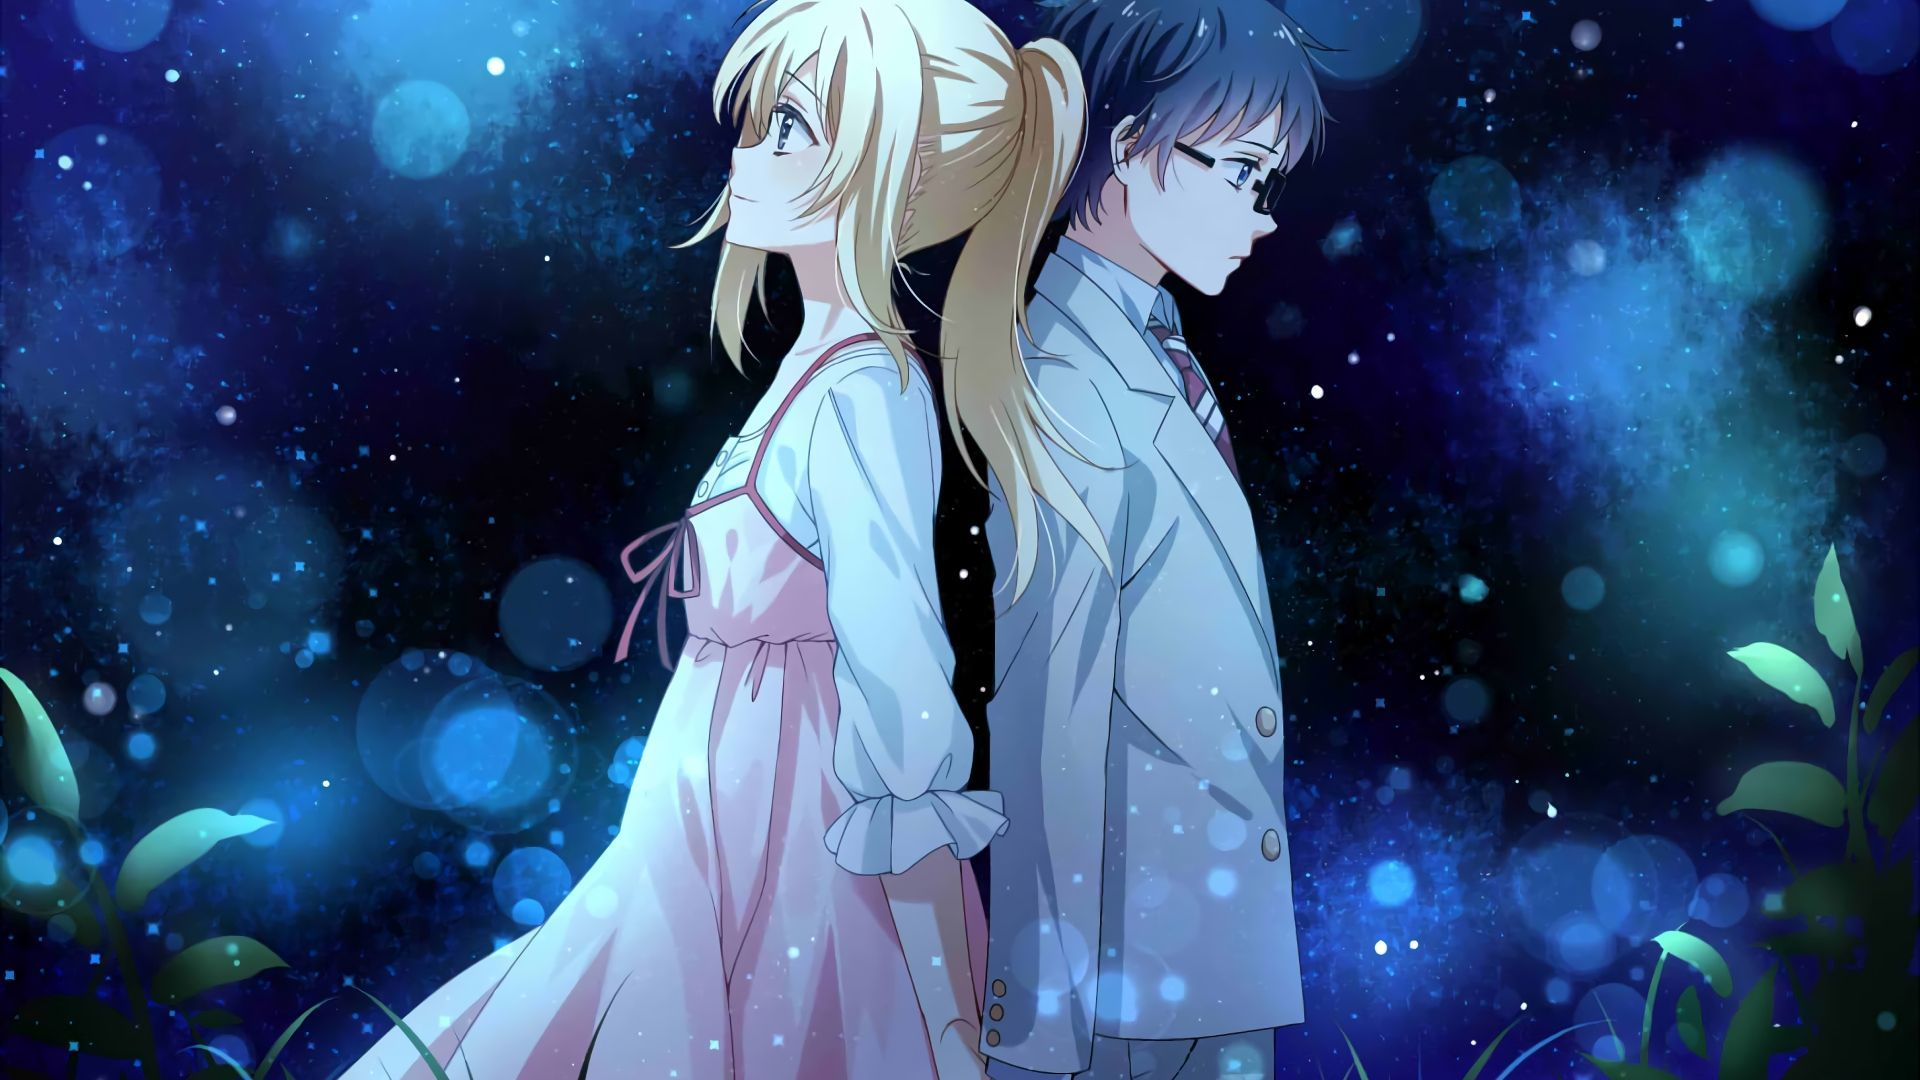 Desktop Wallpaper Anime Couple Kaori Miyazono Kousei Arima Your Lie In April Hd Image Picture Cute Laptop Wallpaper Hd Anime Wallpapers Your Lie In April